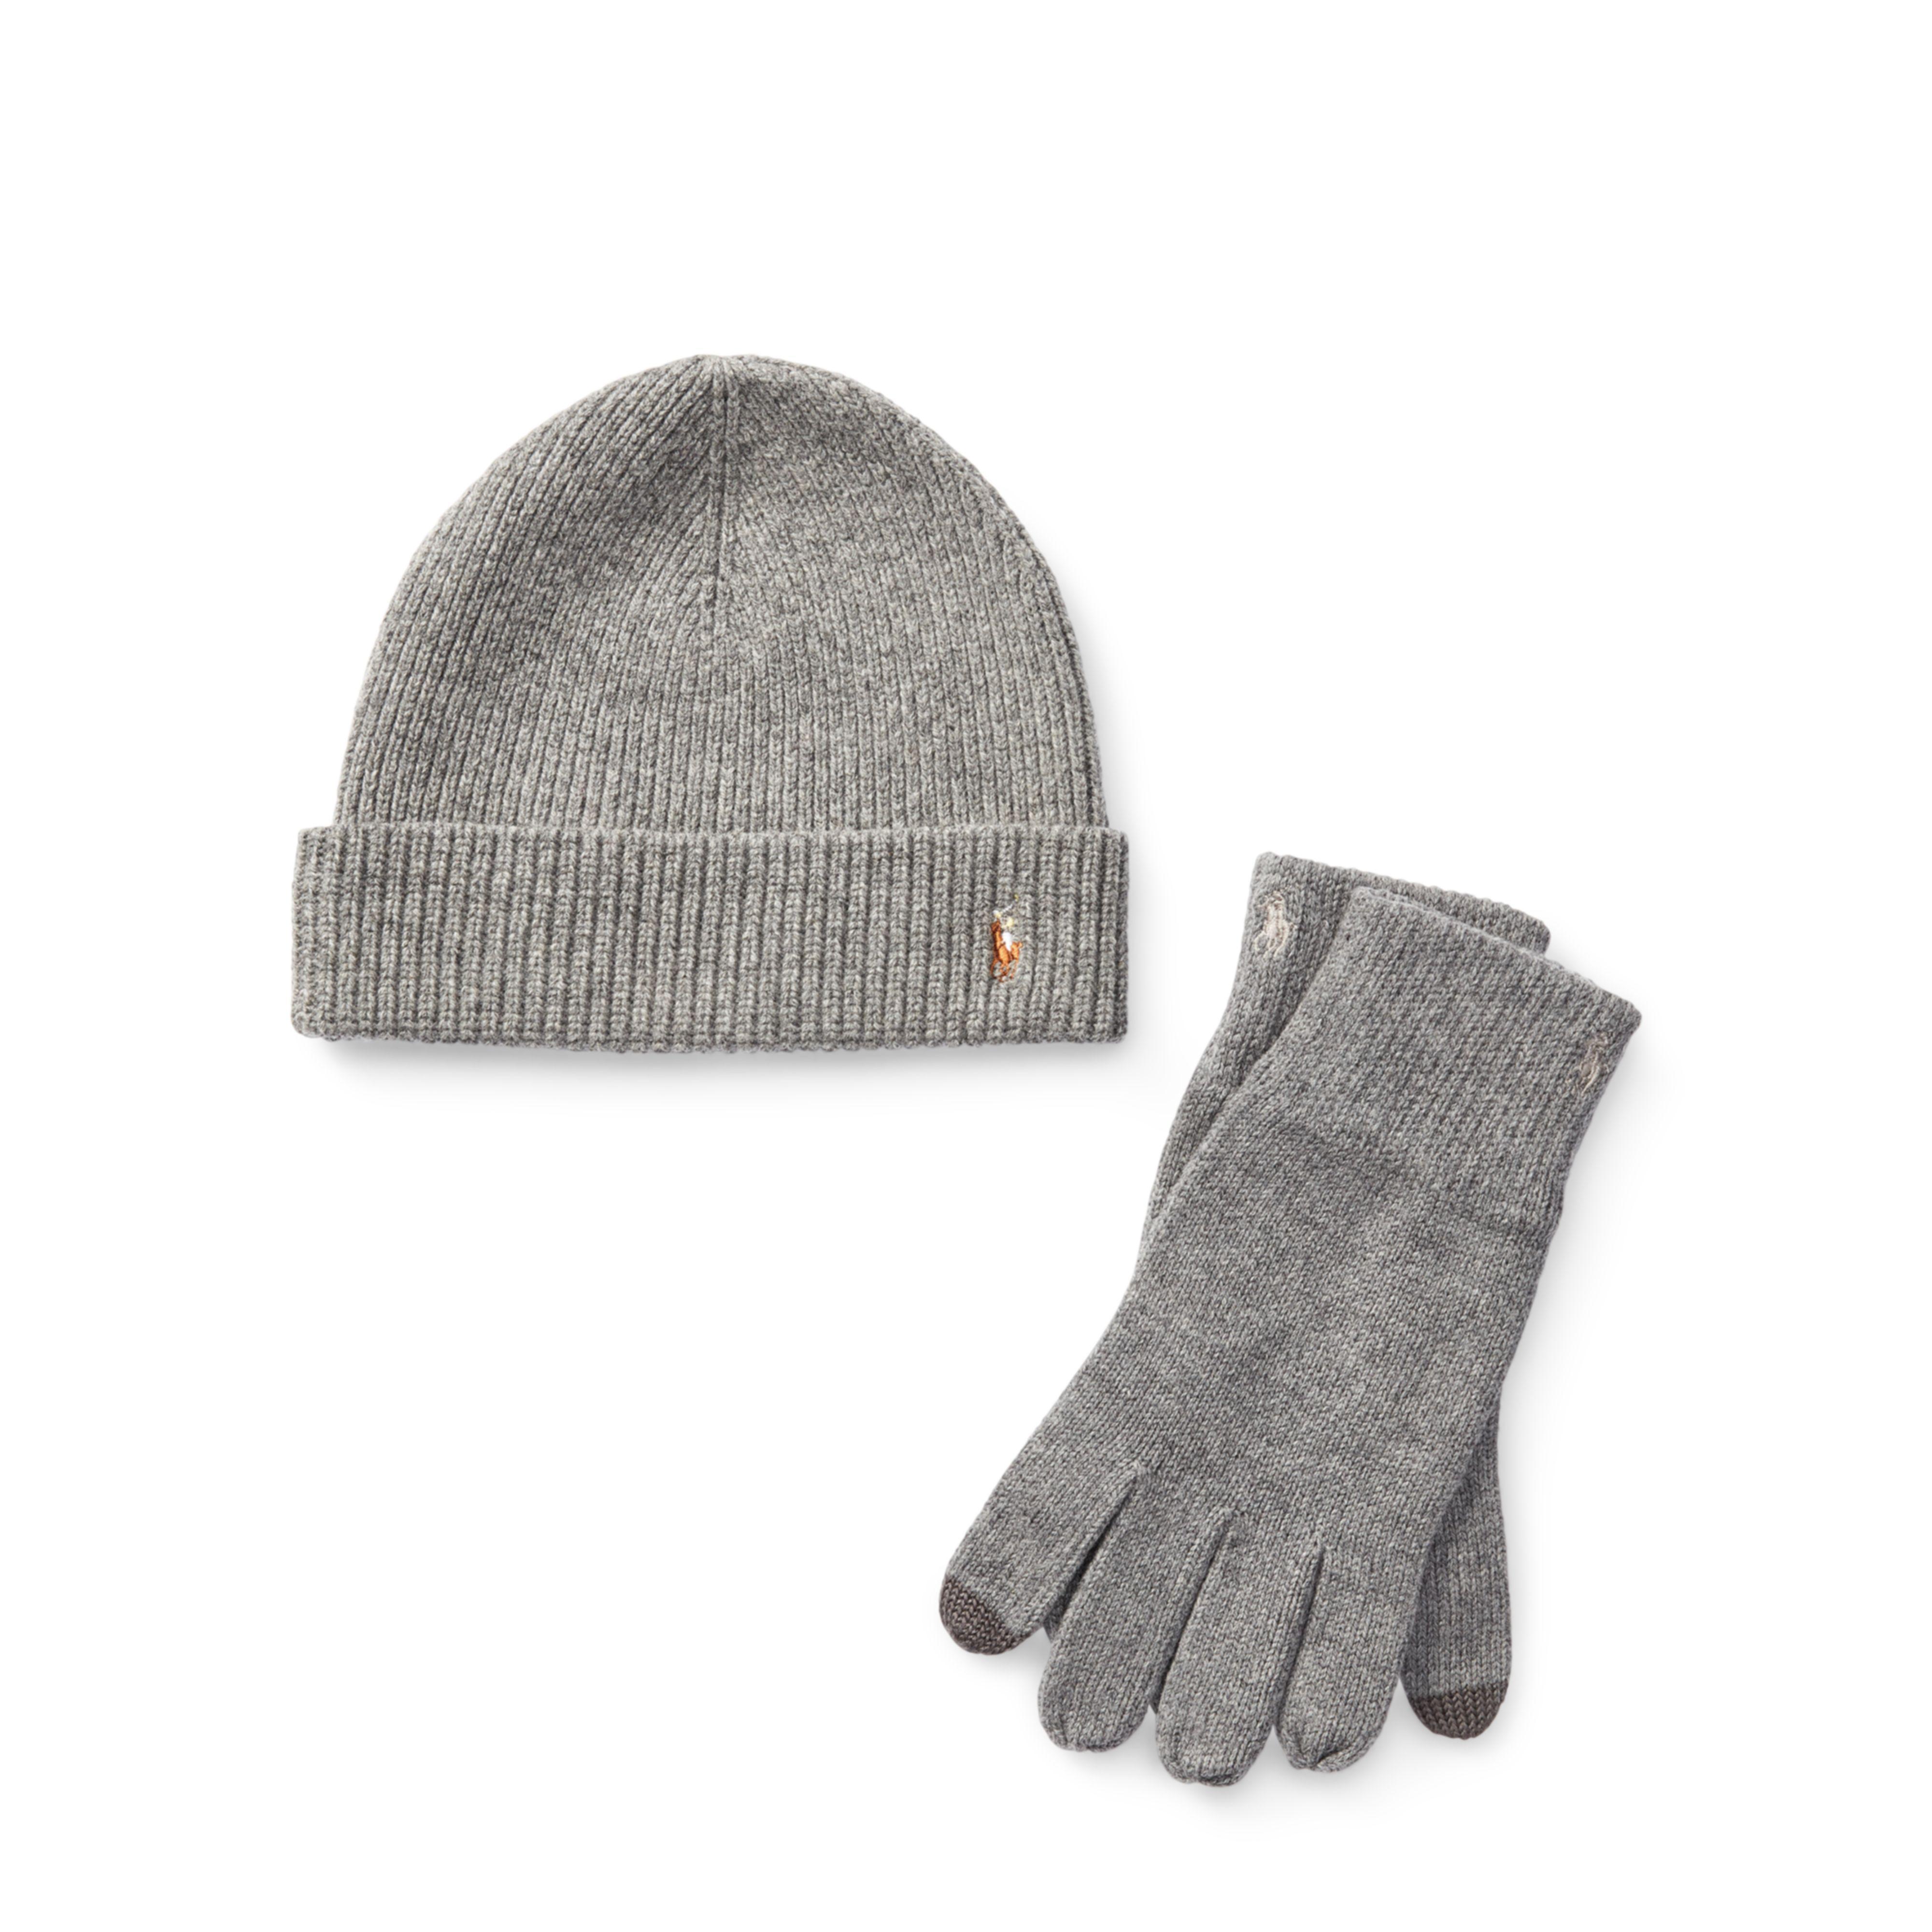 Lyst - Polo Ralph Lauren Merino Hat   Gloves Gift Set in Gray b996ea48bc74